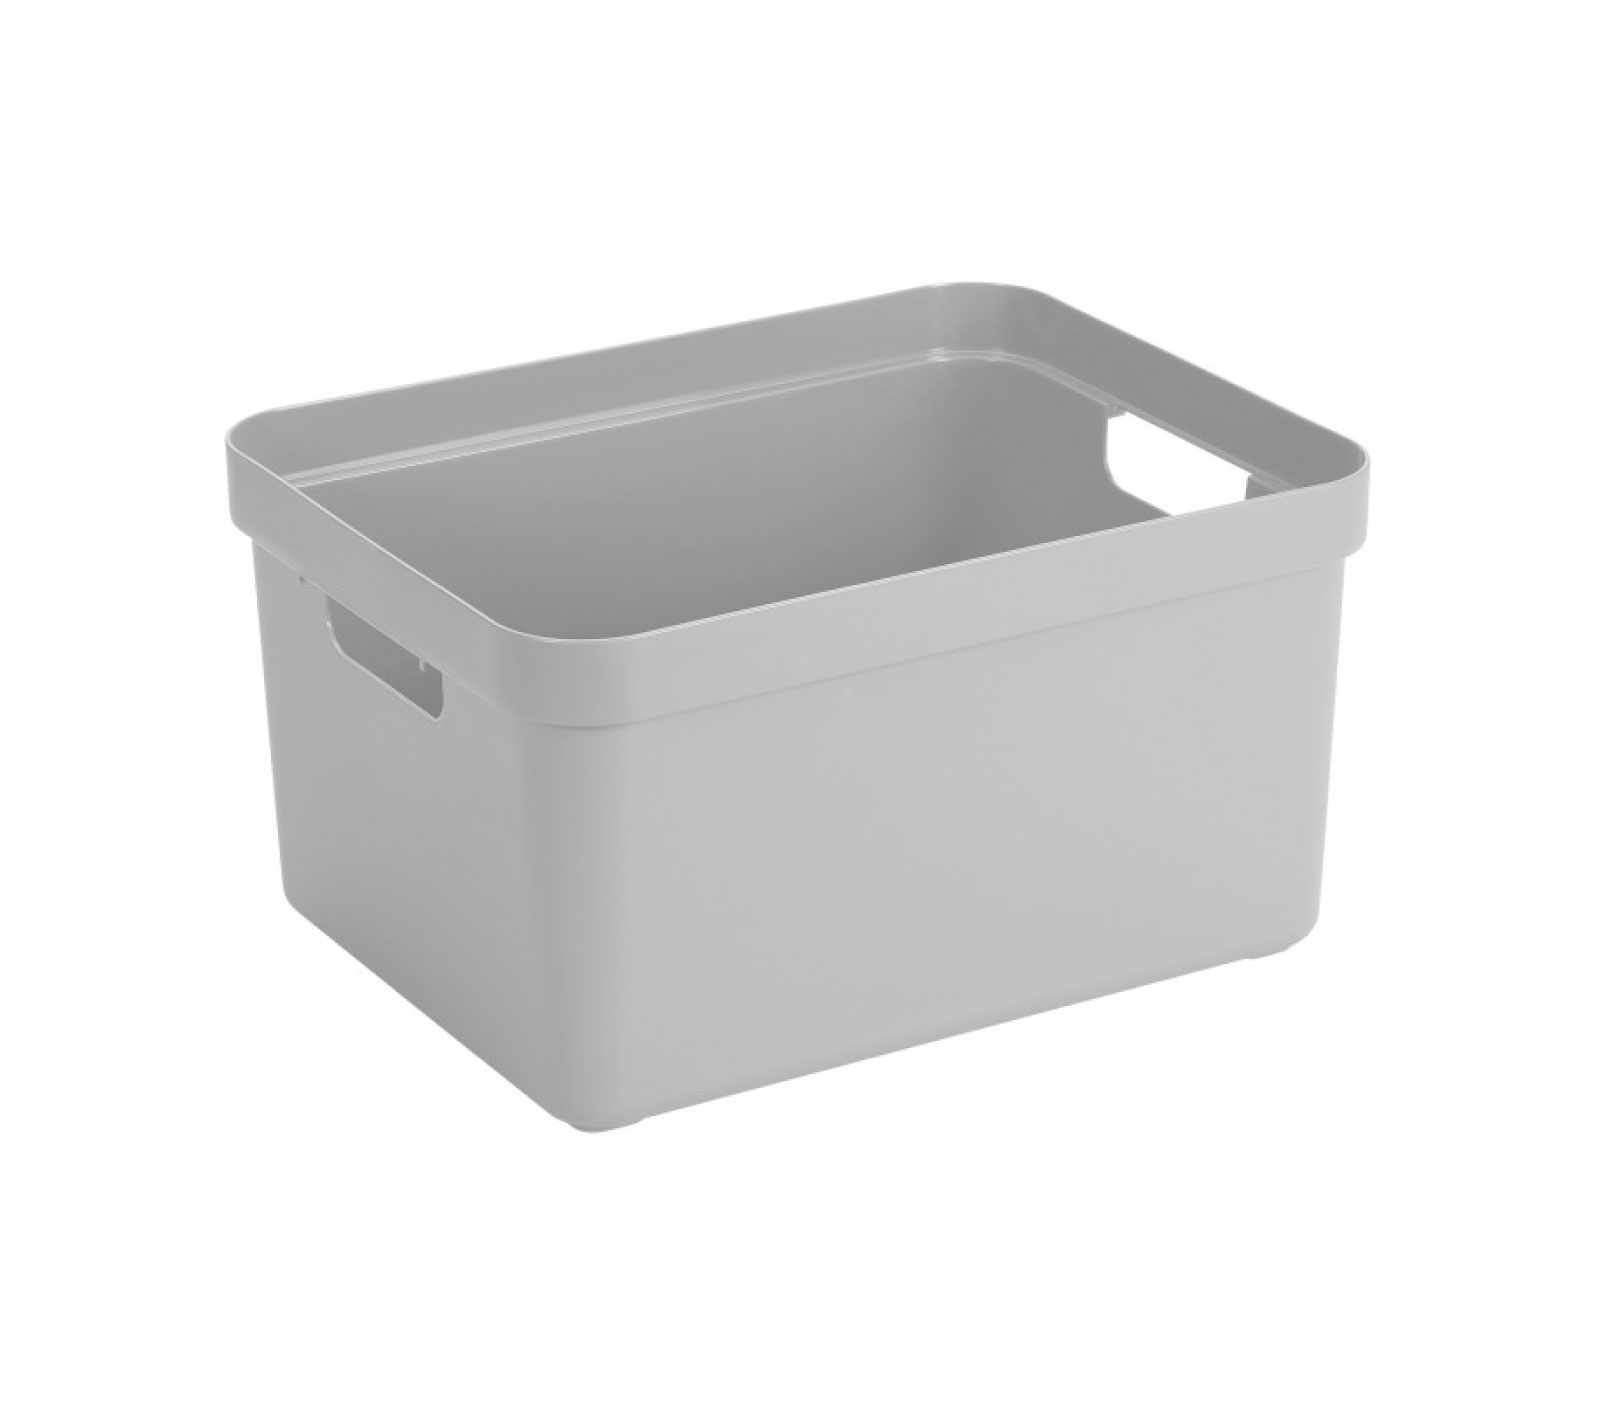 Sunware Sigma Home Box